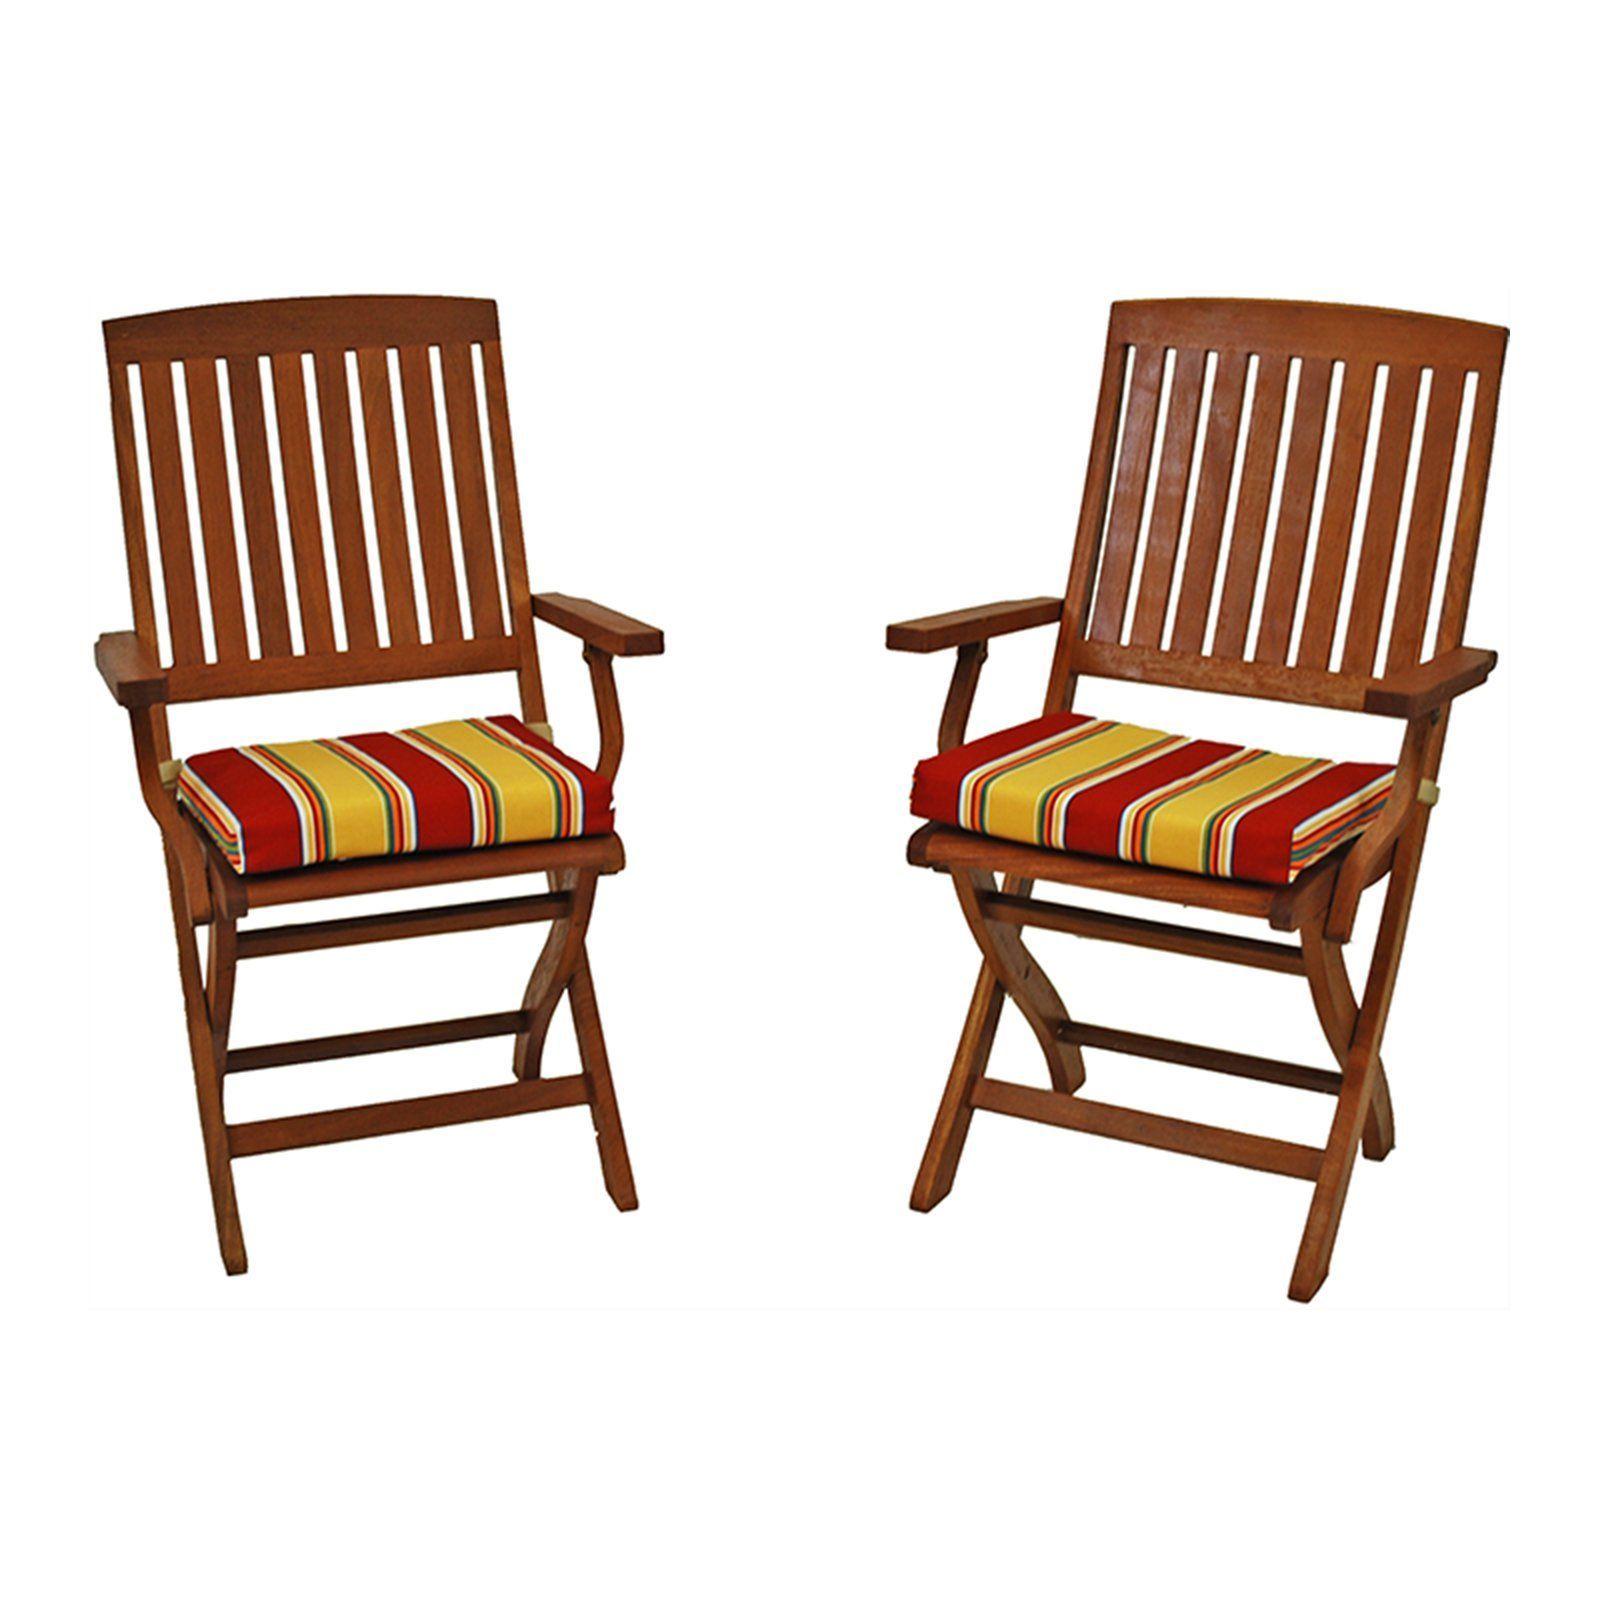 blazing needles outdoor 17 5 x 15 in folding chair cushion set of rh pinterest com